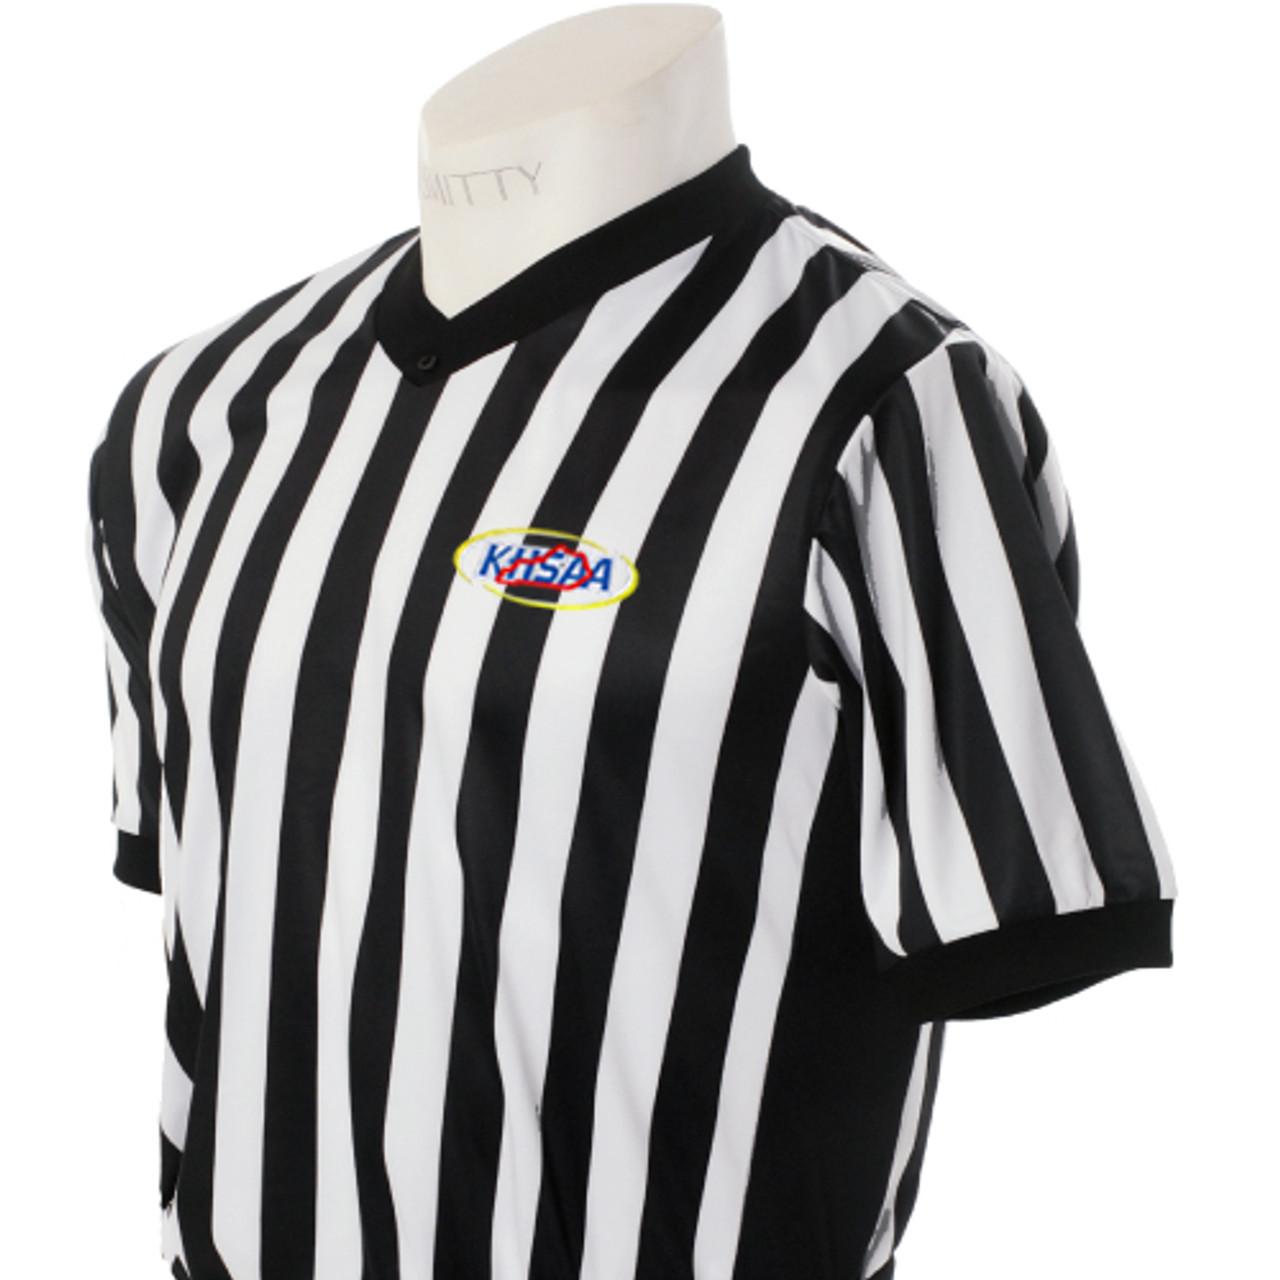 Kentucky KHSAA Elite Side Panel Referee Shirt